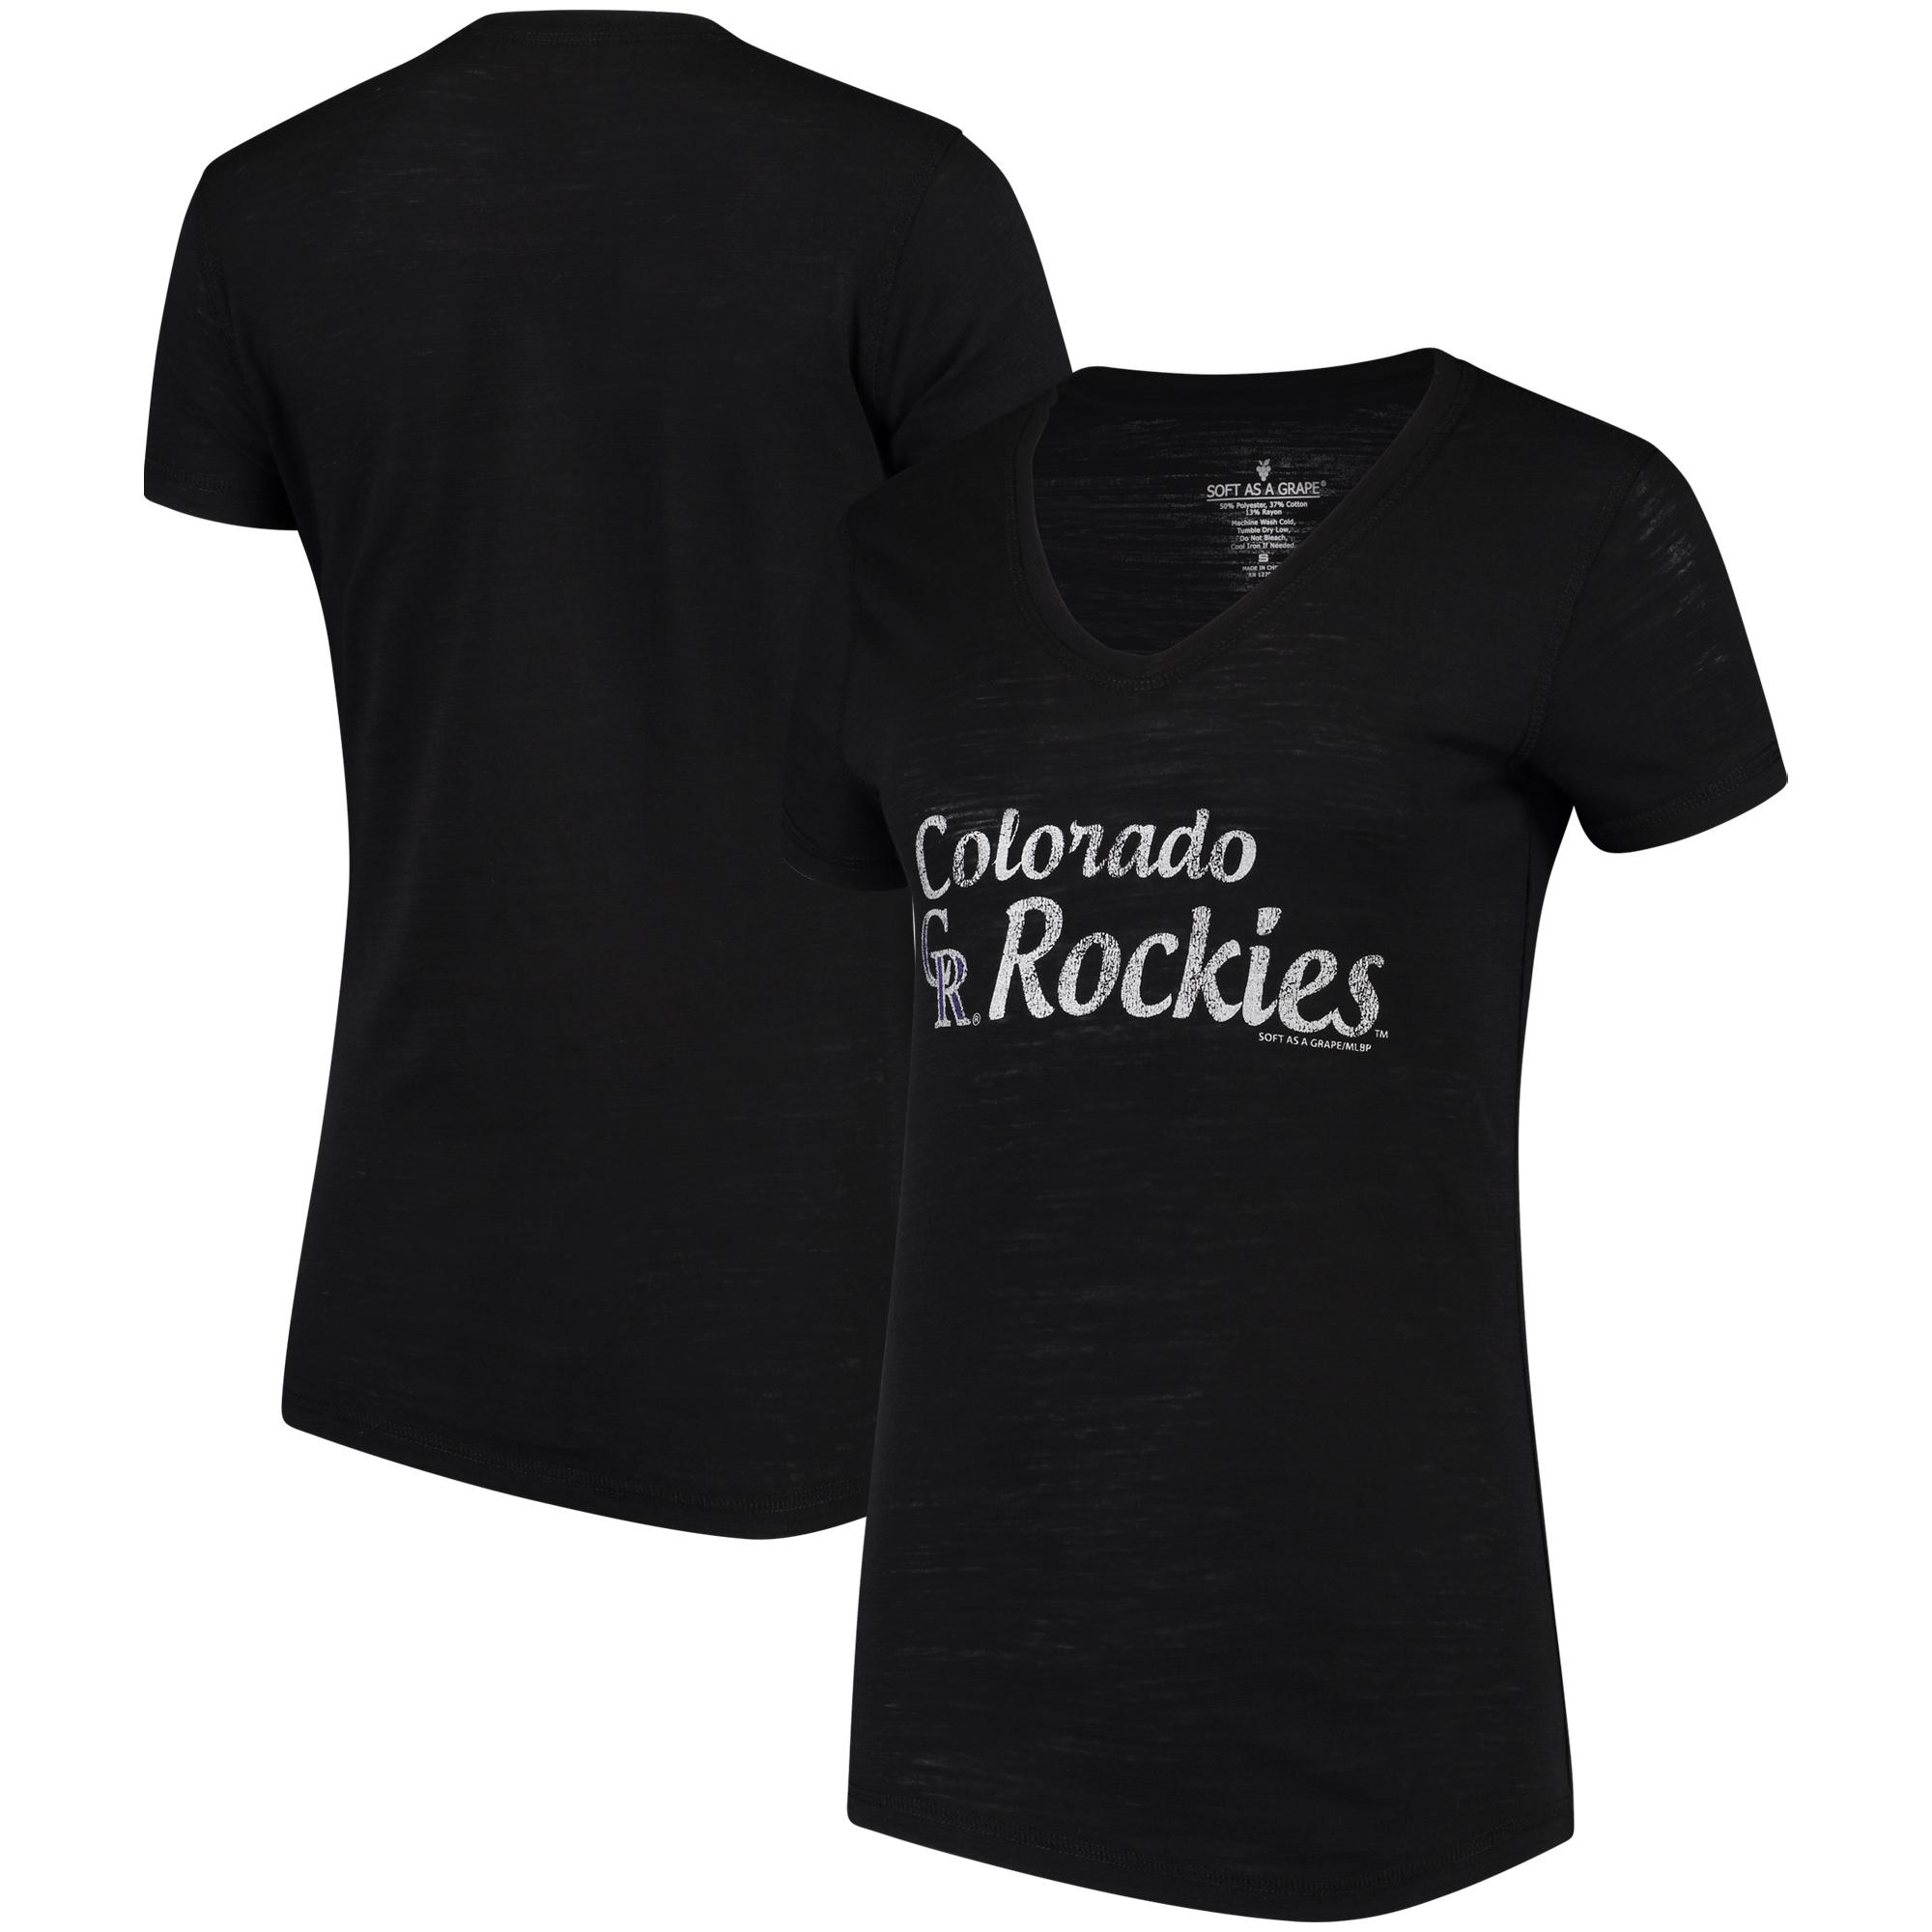 Colorado Rockies Soft As A Grape Women's Double Steal Tri-Blend V-Neck T-Shirt - Black